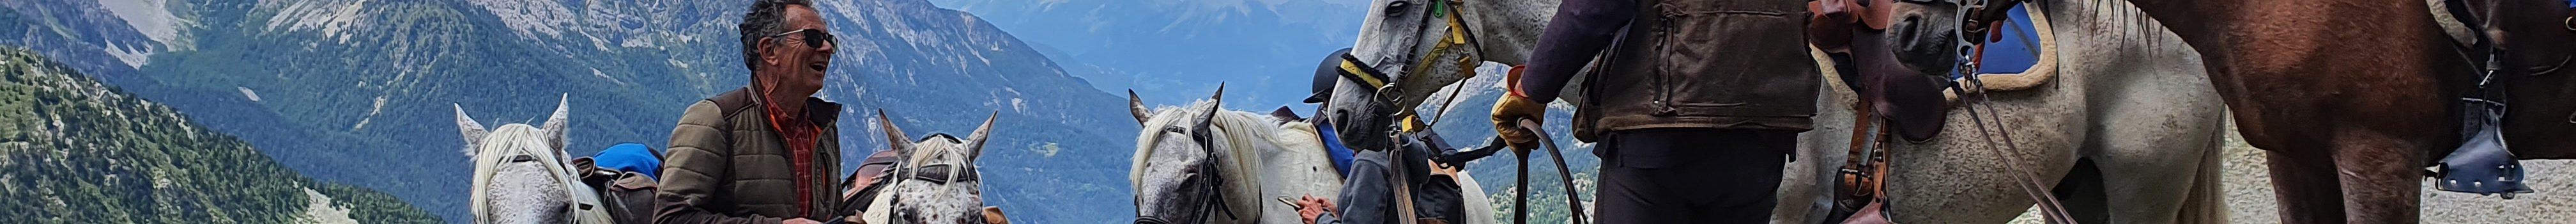 randonnée-cheval-cavalquinta-2020-alpes (13)